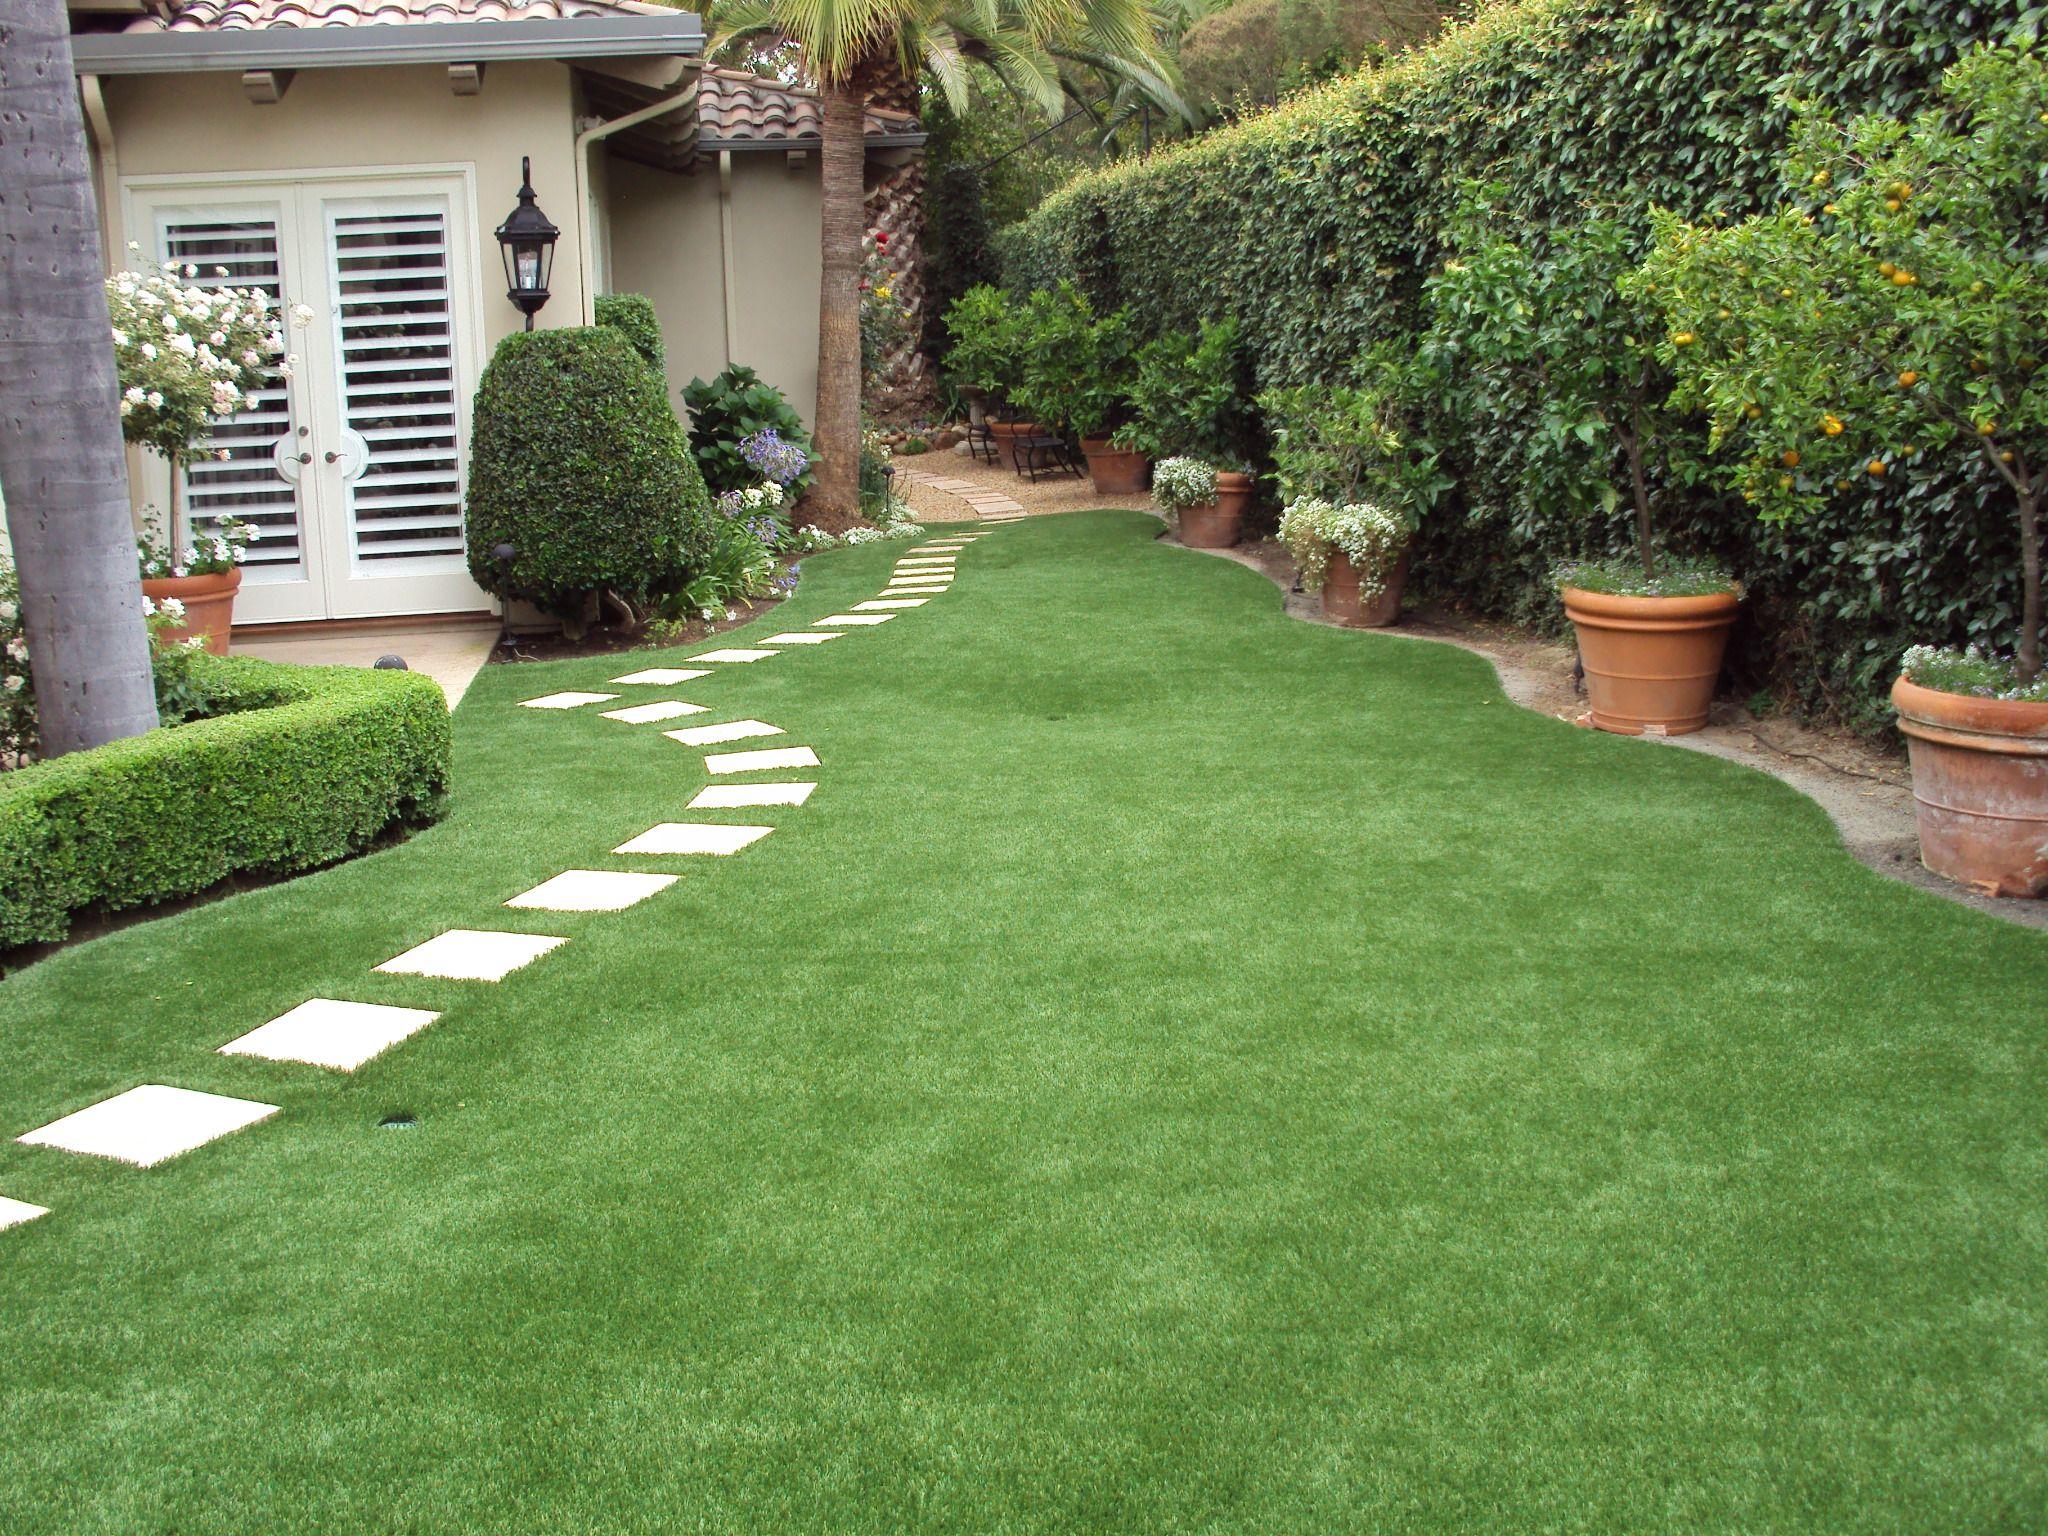 Artificial turf backyard transformation rancho santa fe ca for Back garden designs images